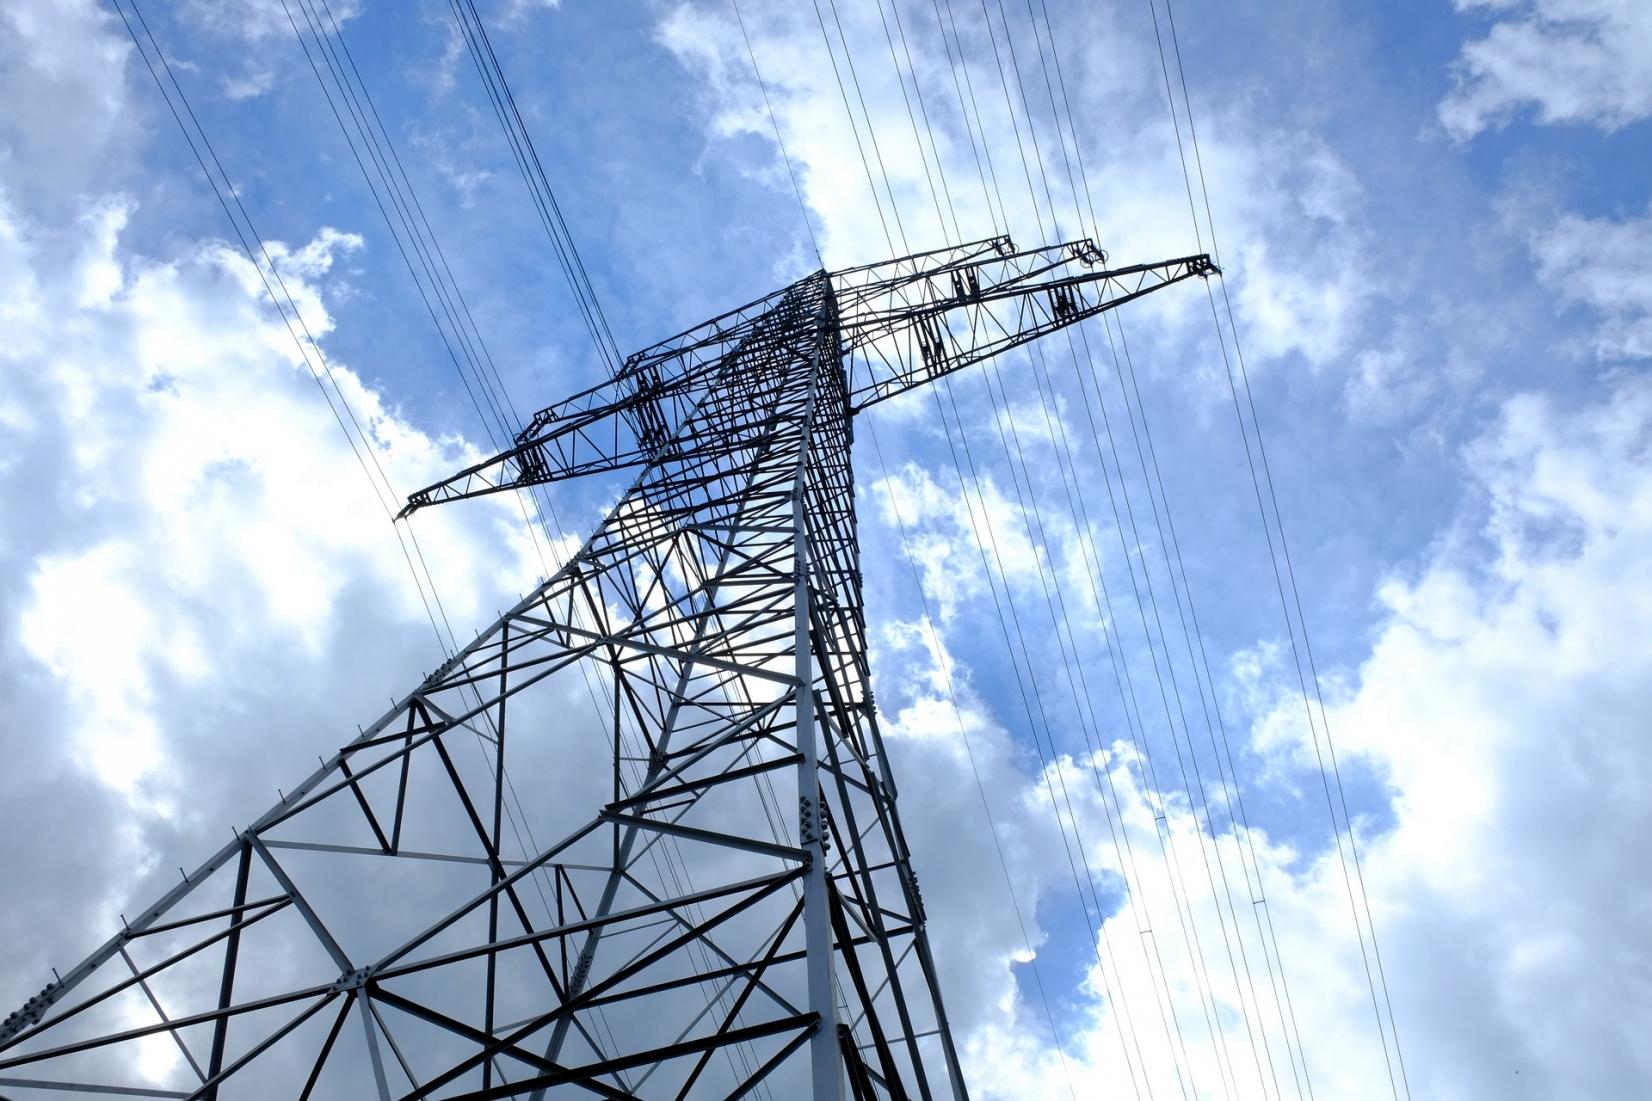 powerline-pylon_pixabay.jpg